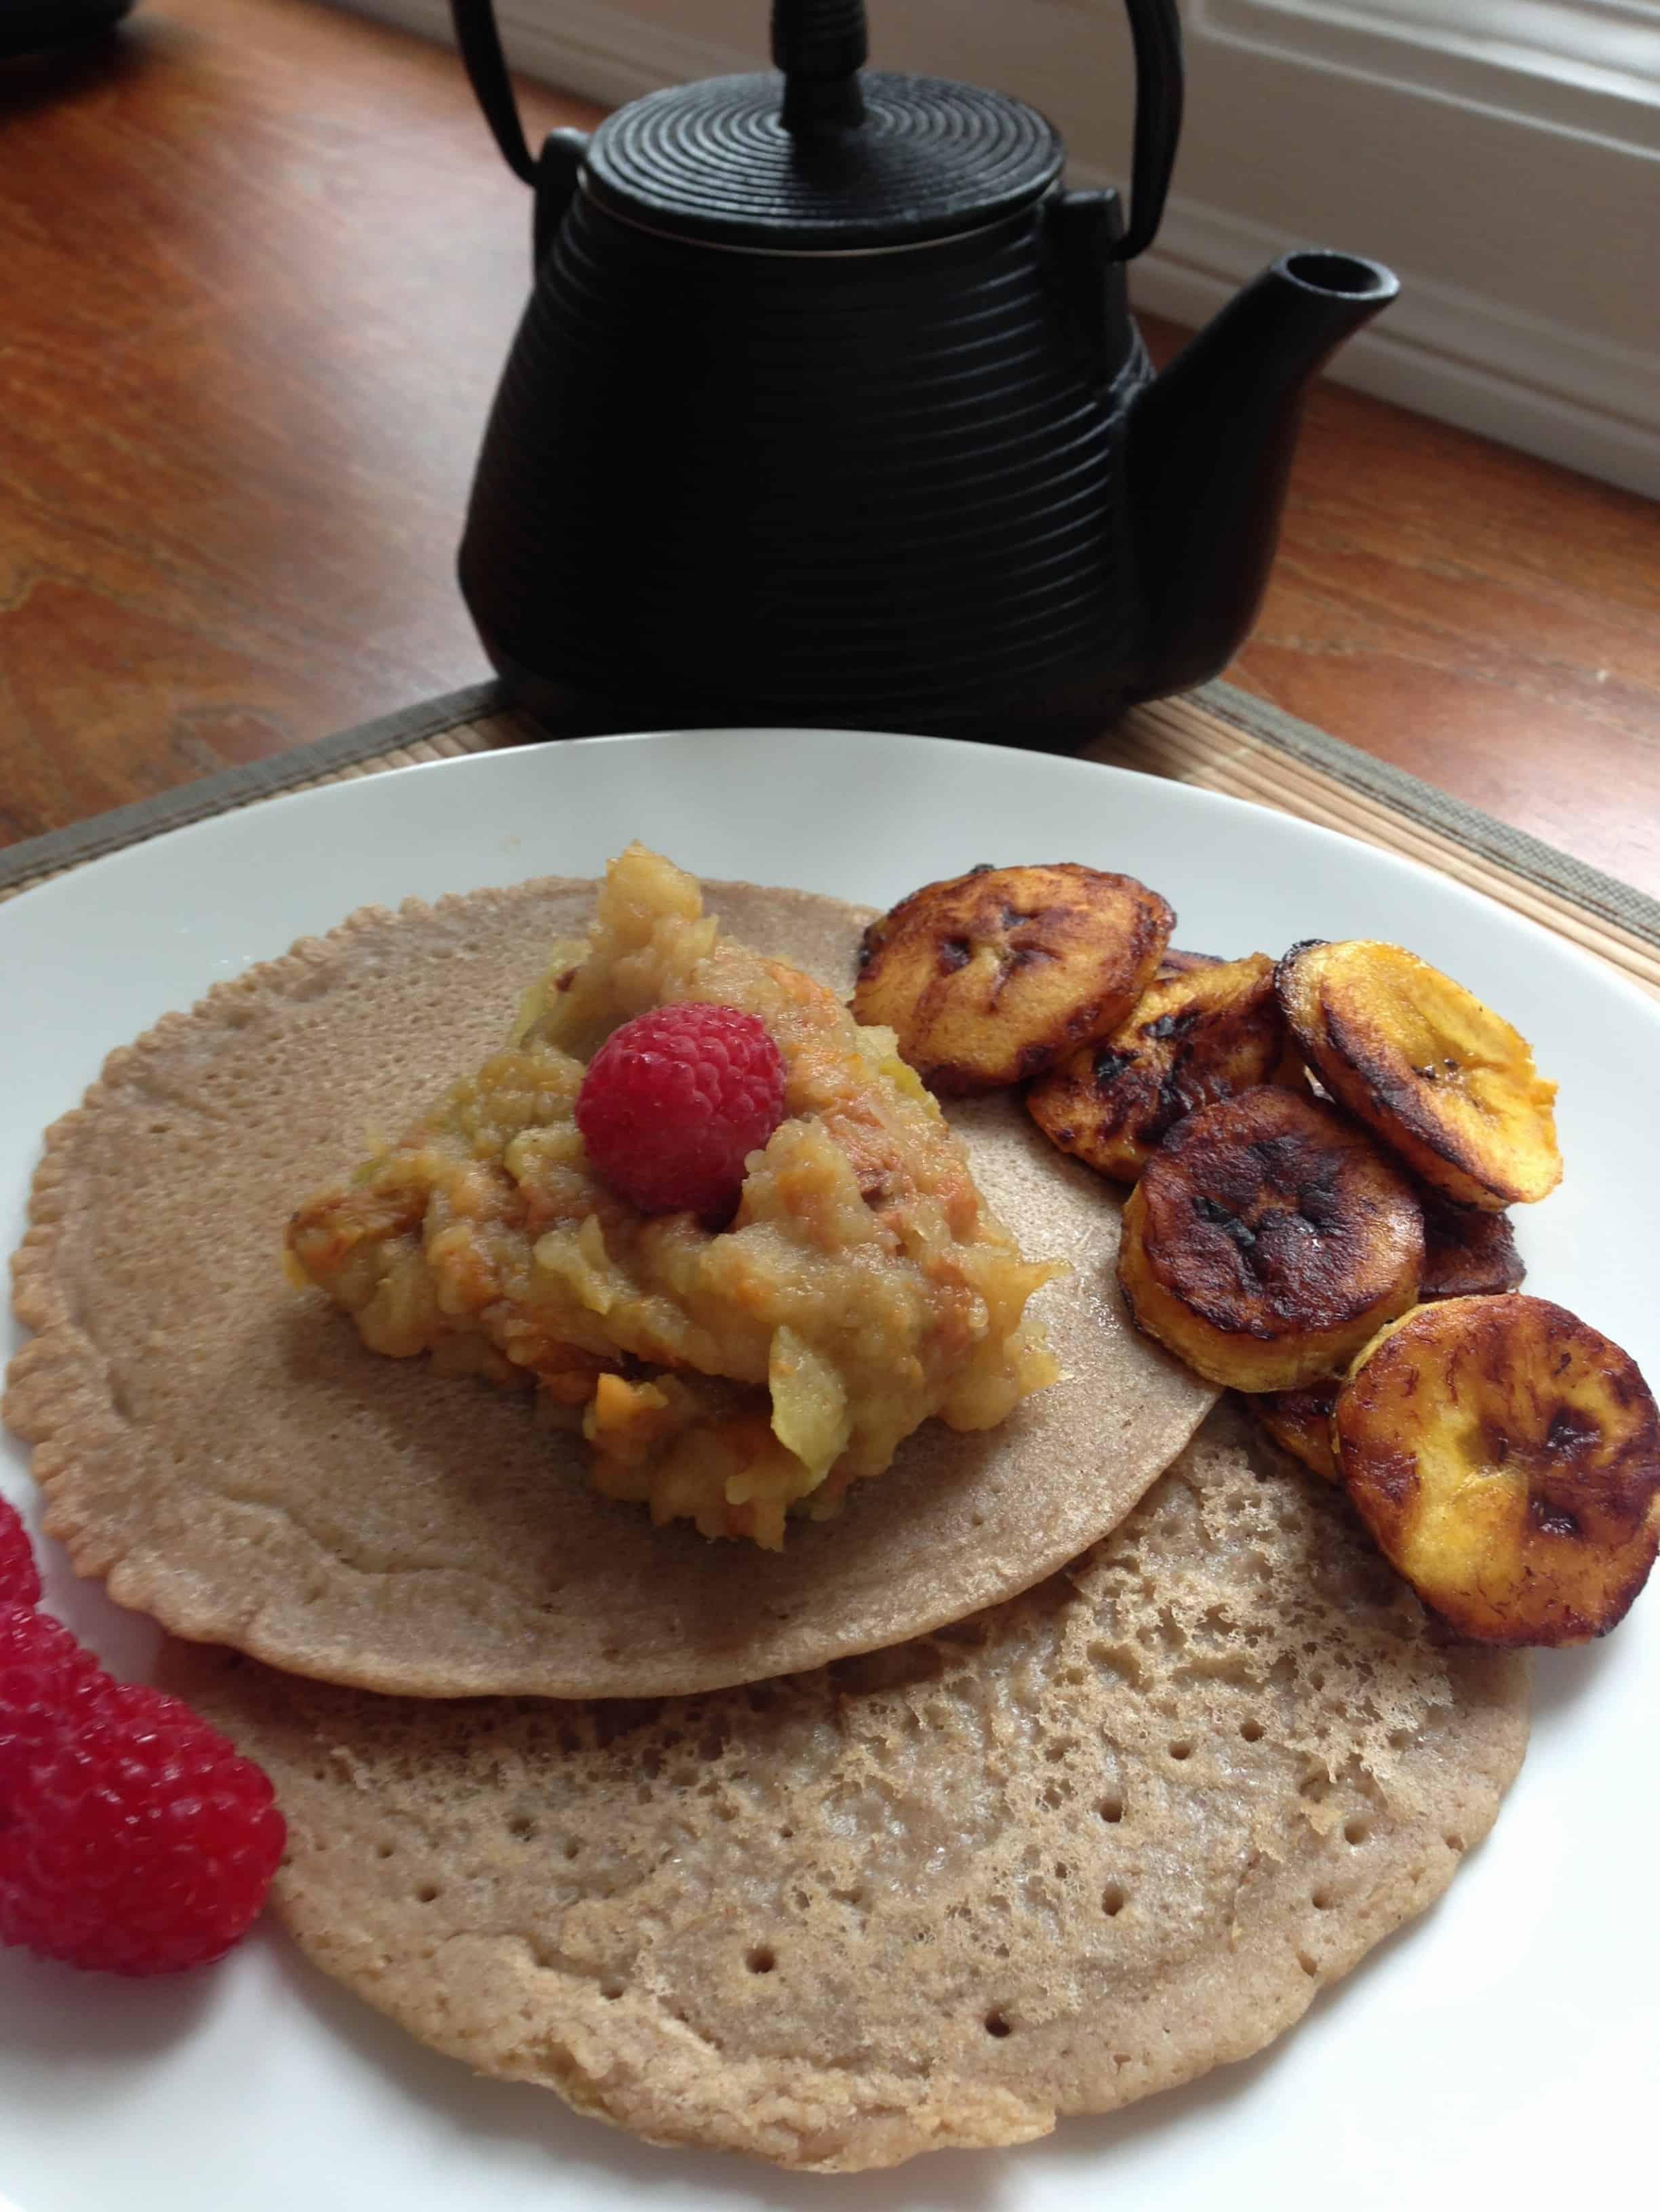 Tri Holistic Nutrition Gluten free, dairy free, sugar free, nut free, egg free, vegan breakfast